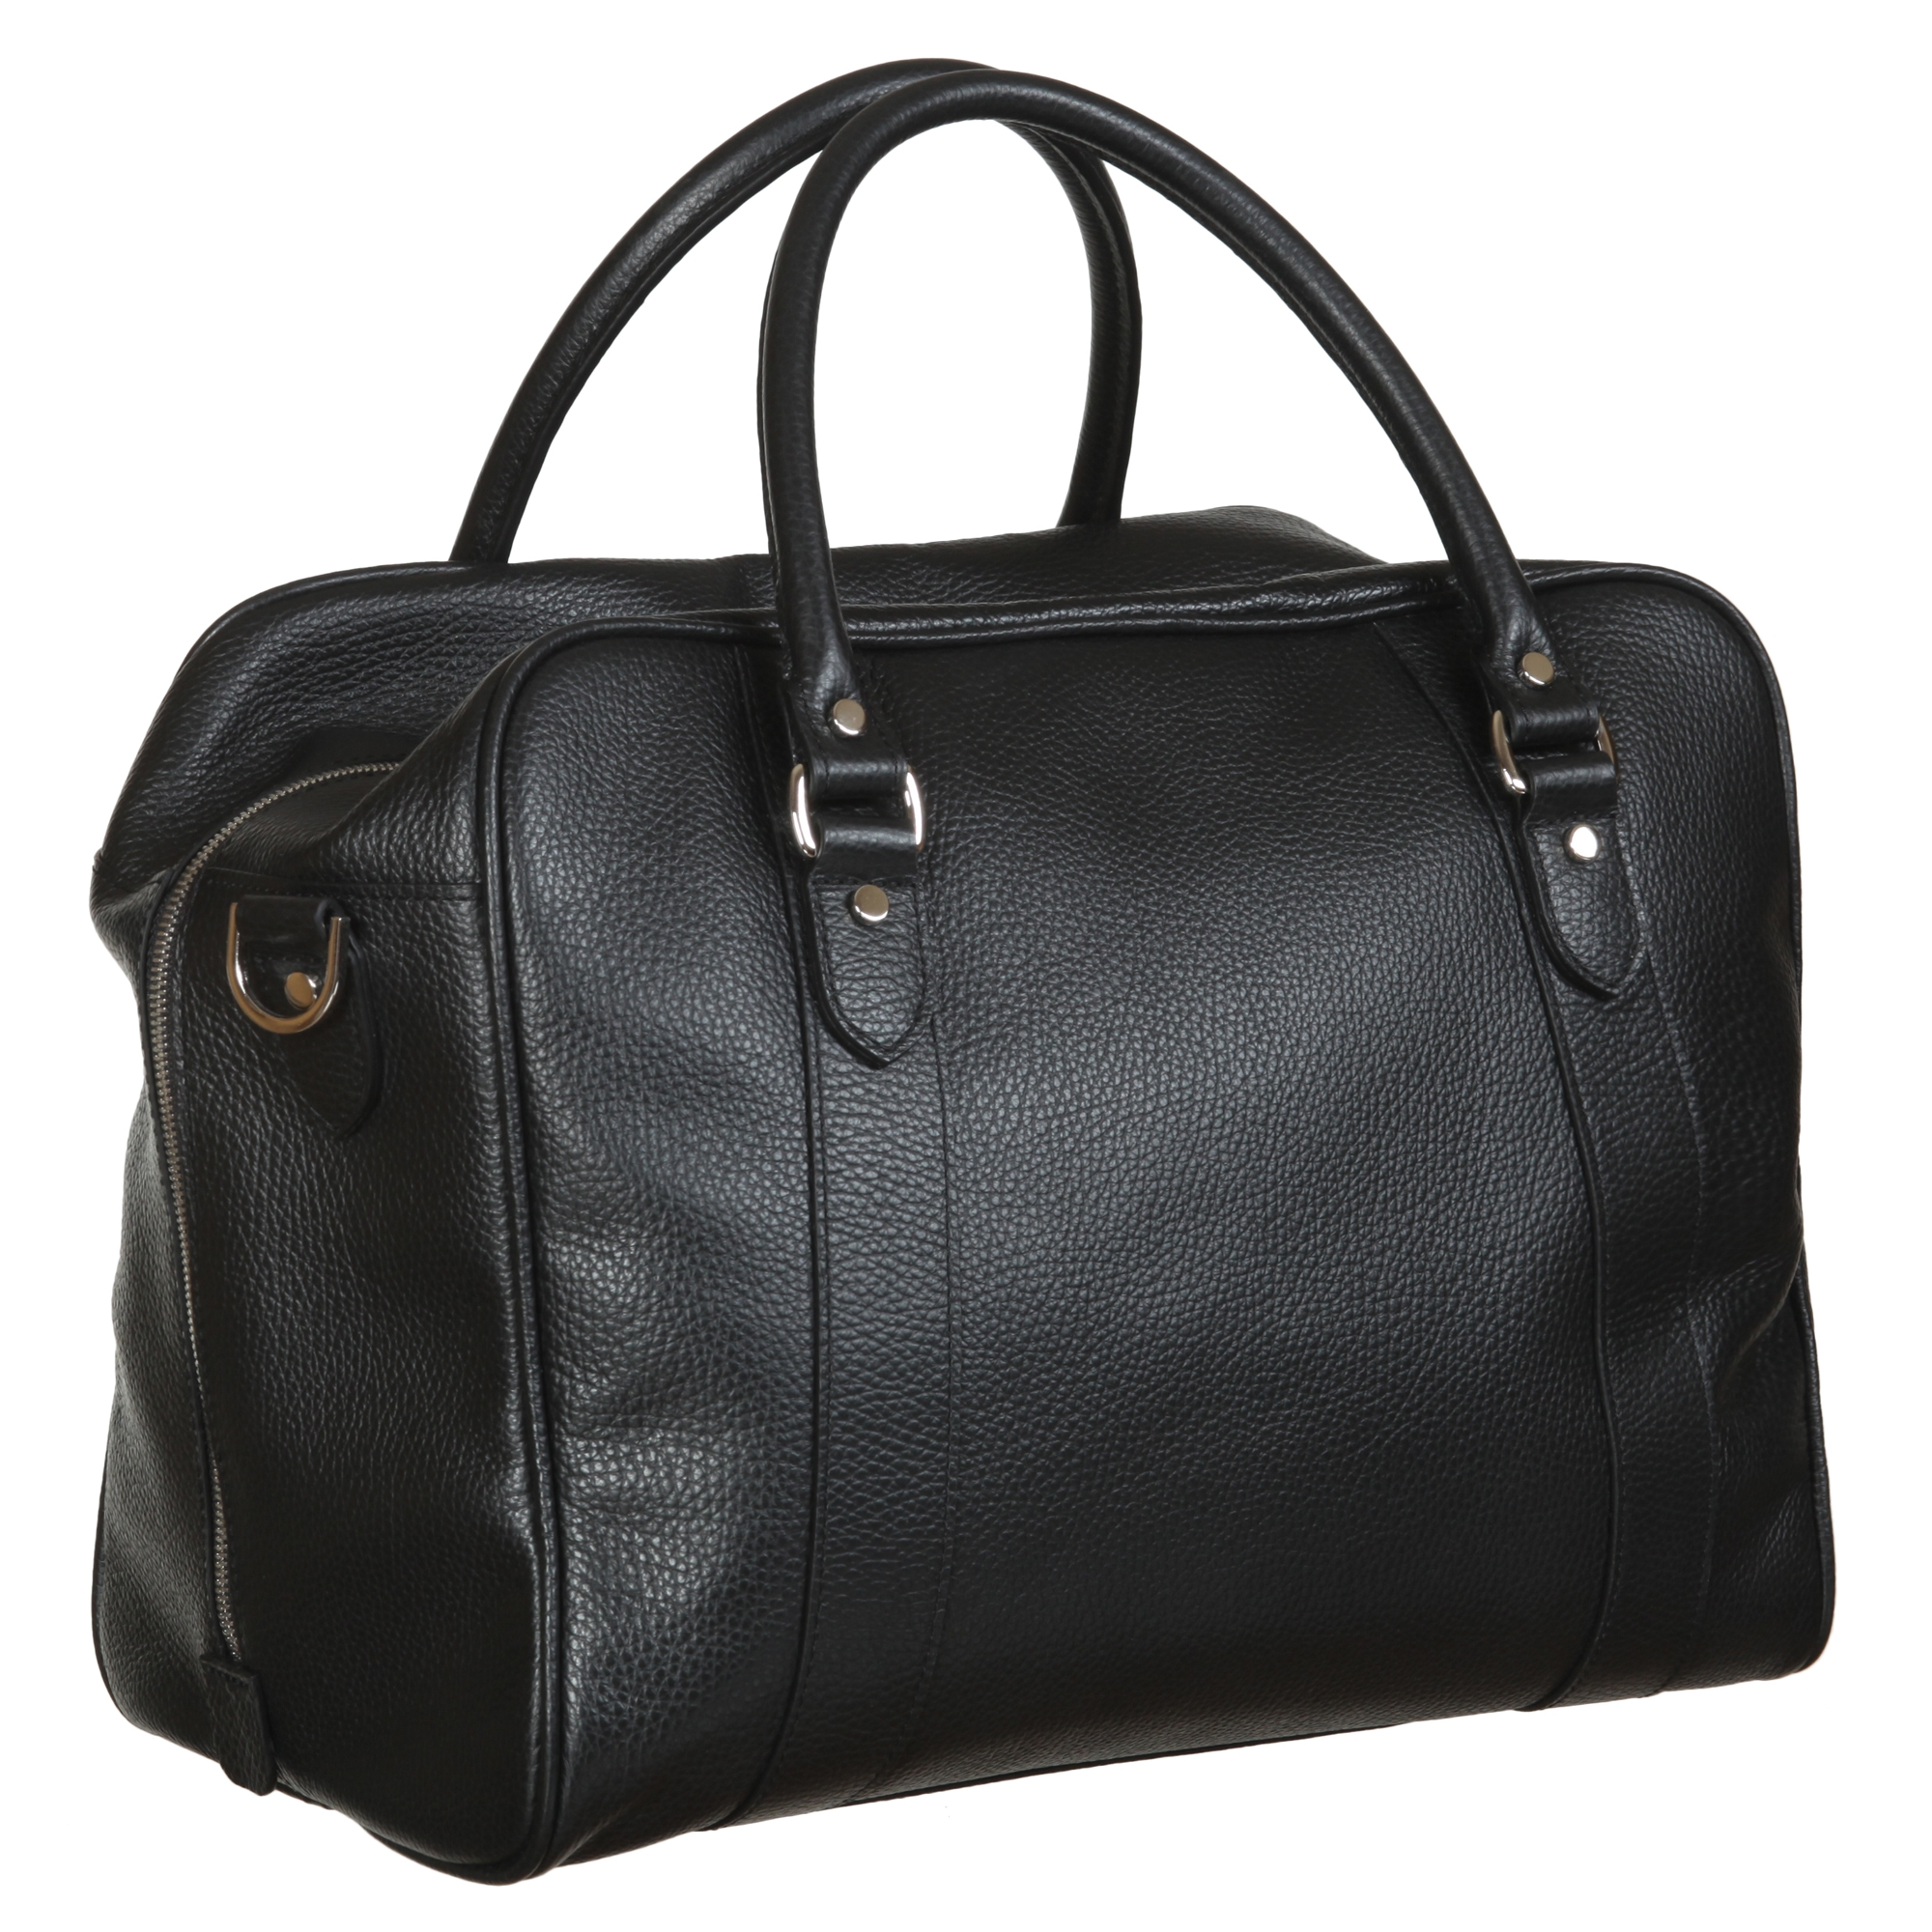 Дорожная сумка Sergio Belotti Napoli 8014 black 30 x 36 x 21 см.